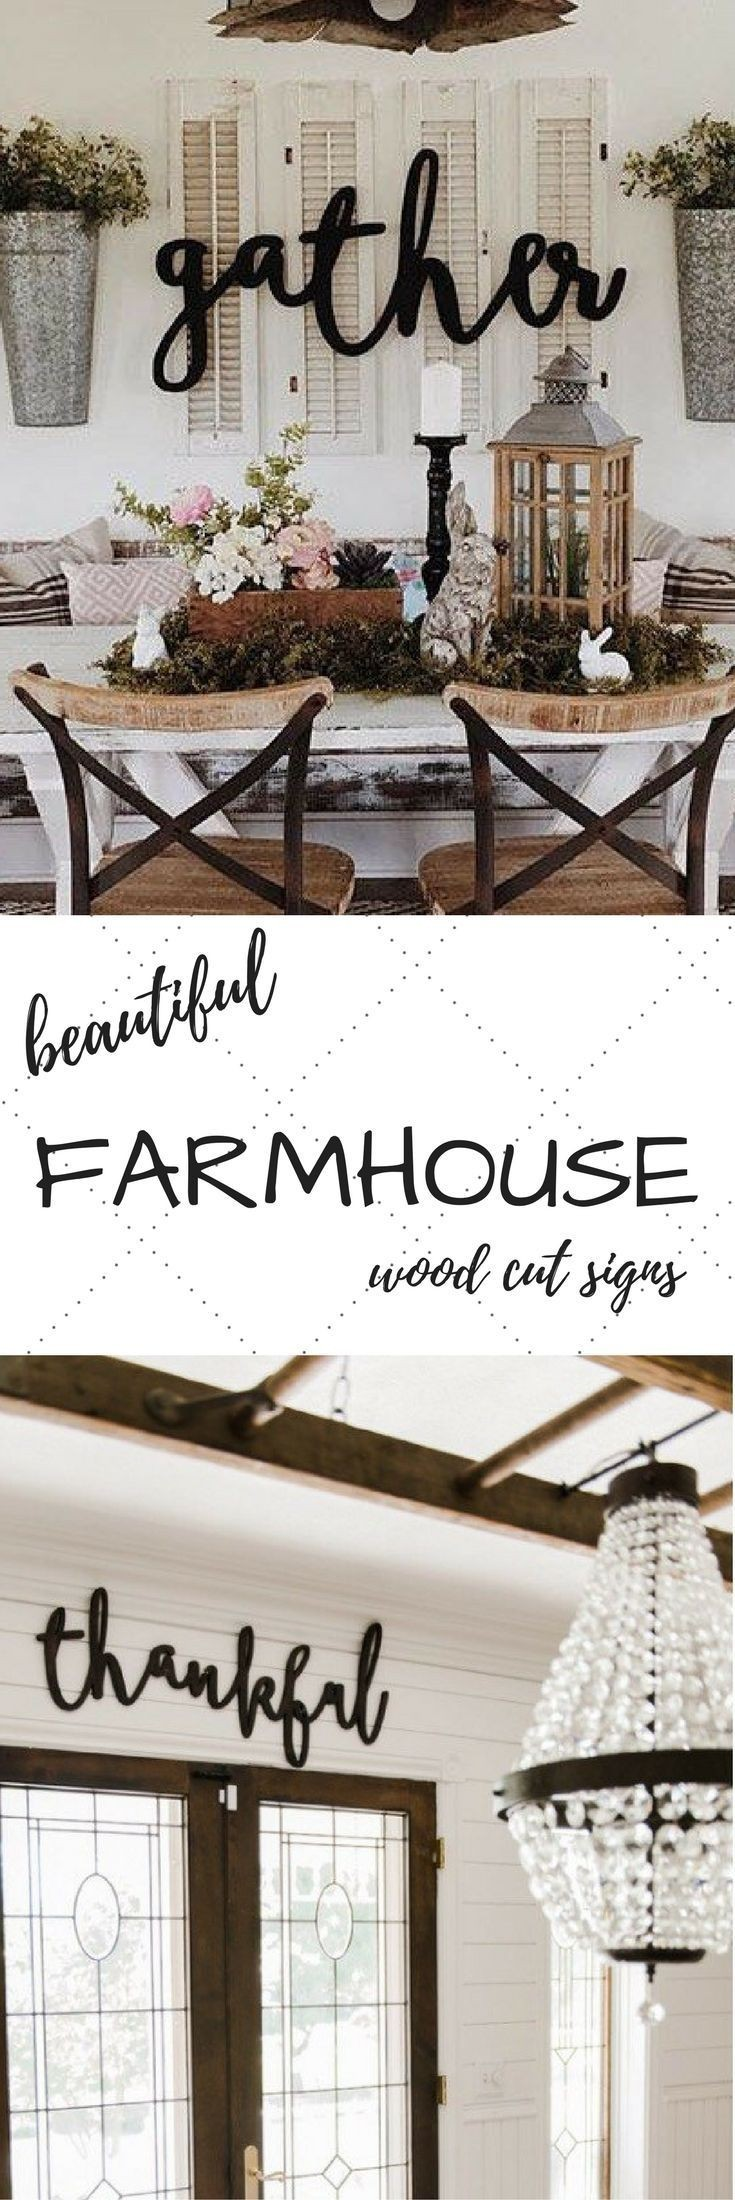 farmhouse wood cut sign wall decor wall